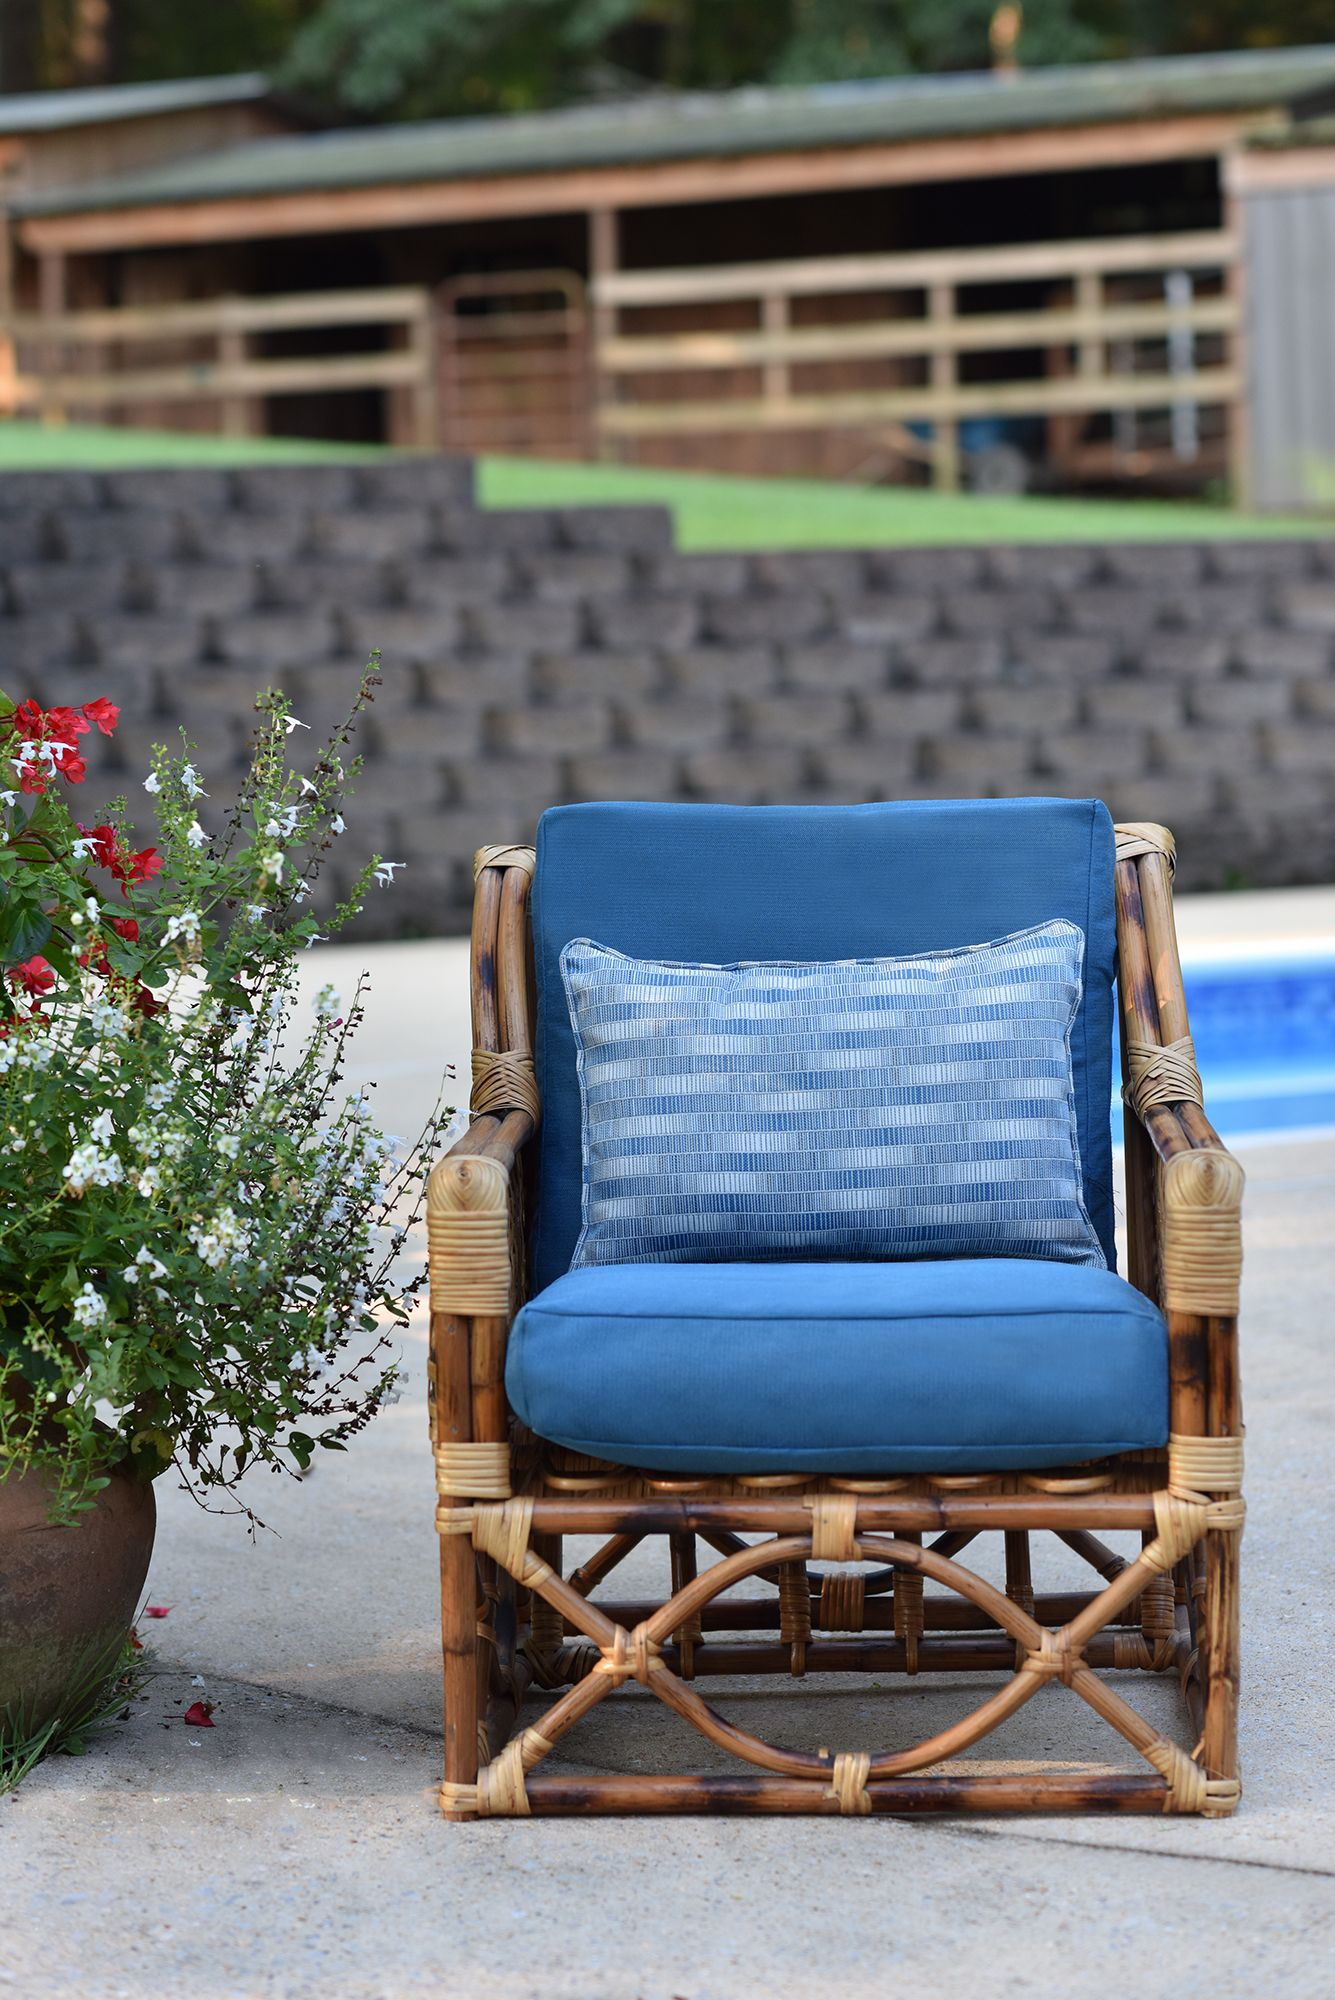 Geobella Cushion Pillow Fabric In 2020 Outdoor Cushions And Pillows Outdoor Upholstery Fabric Upholstery Fabric